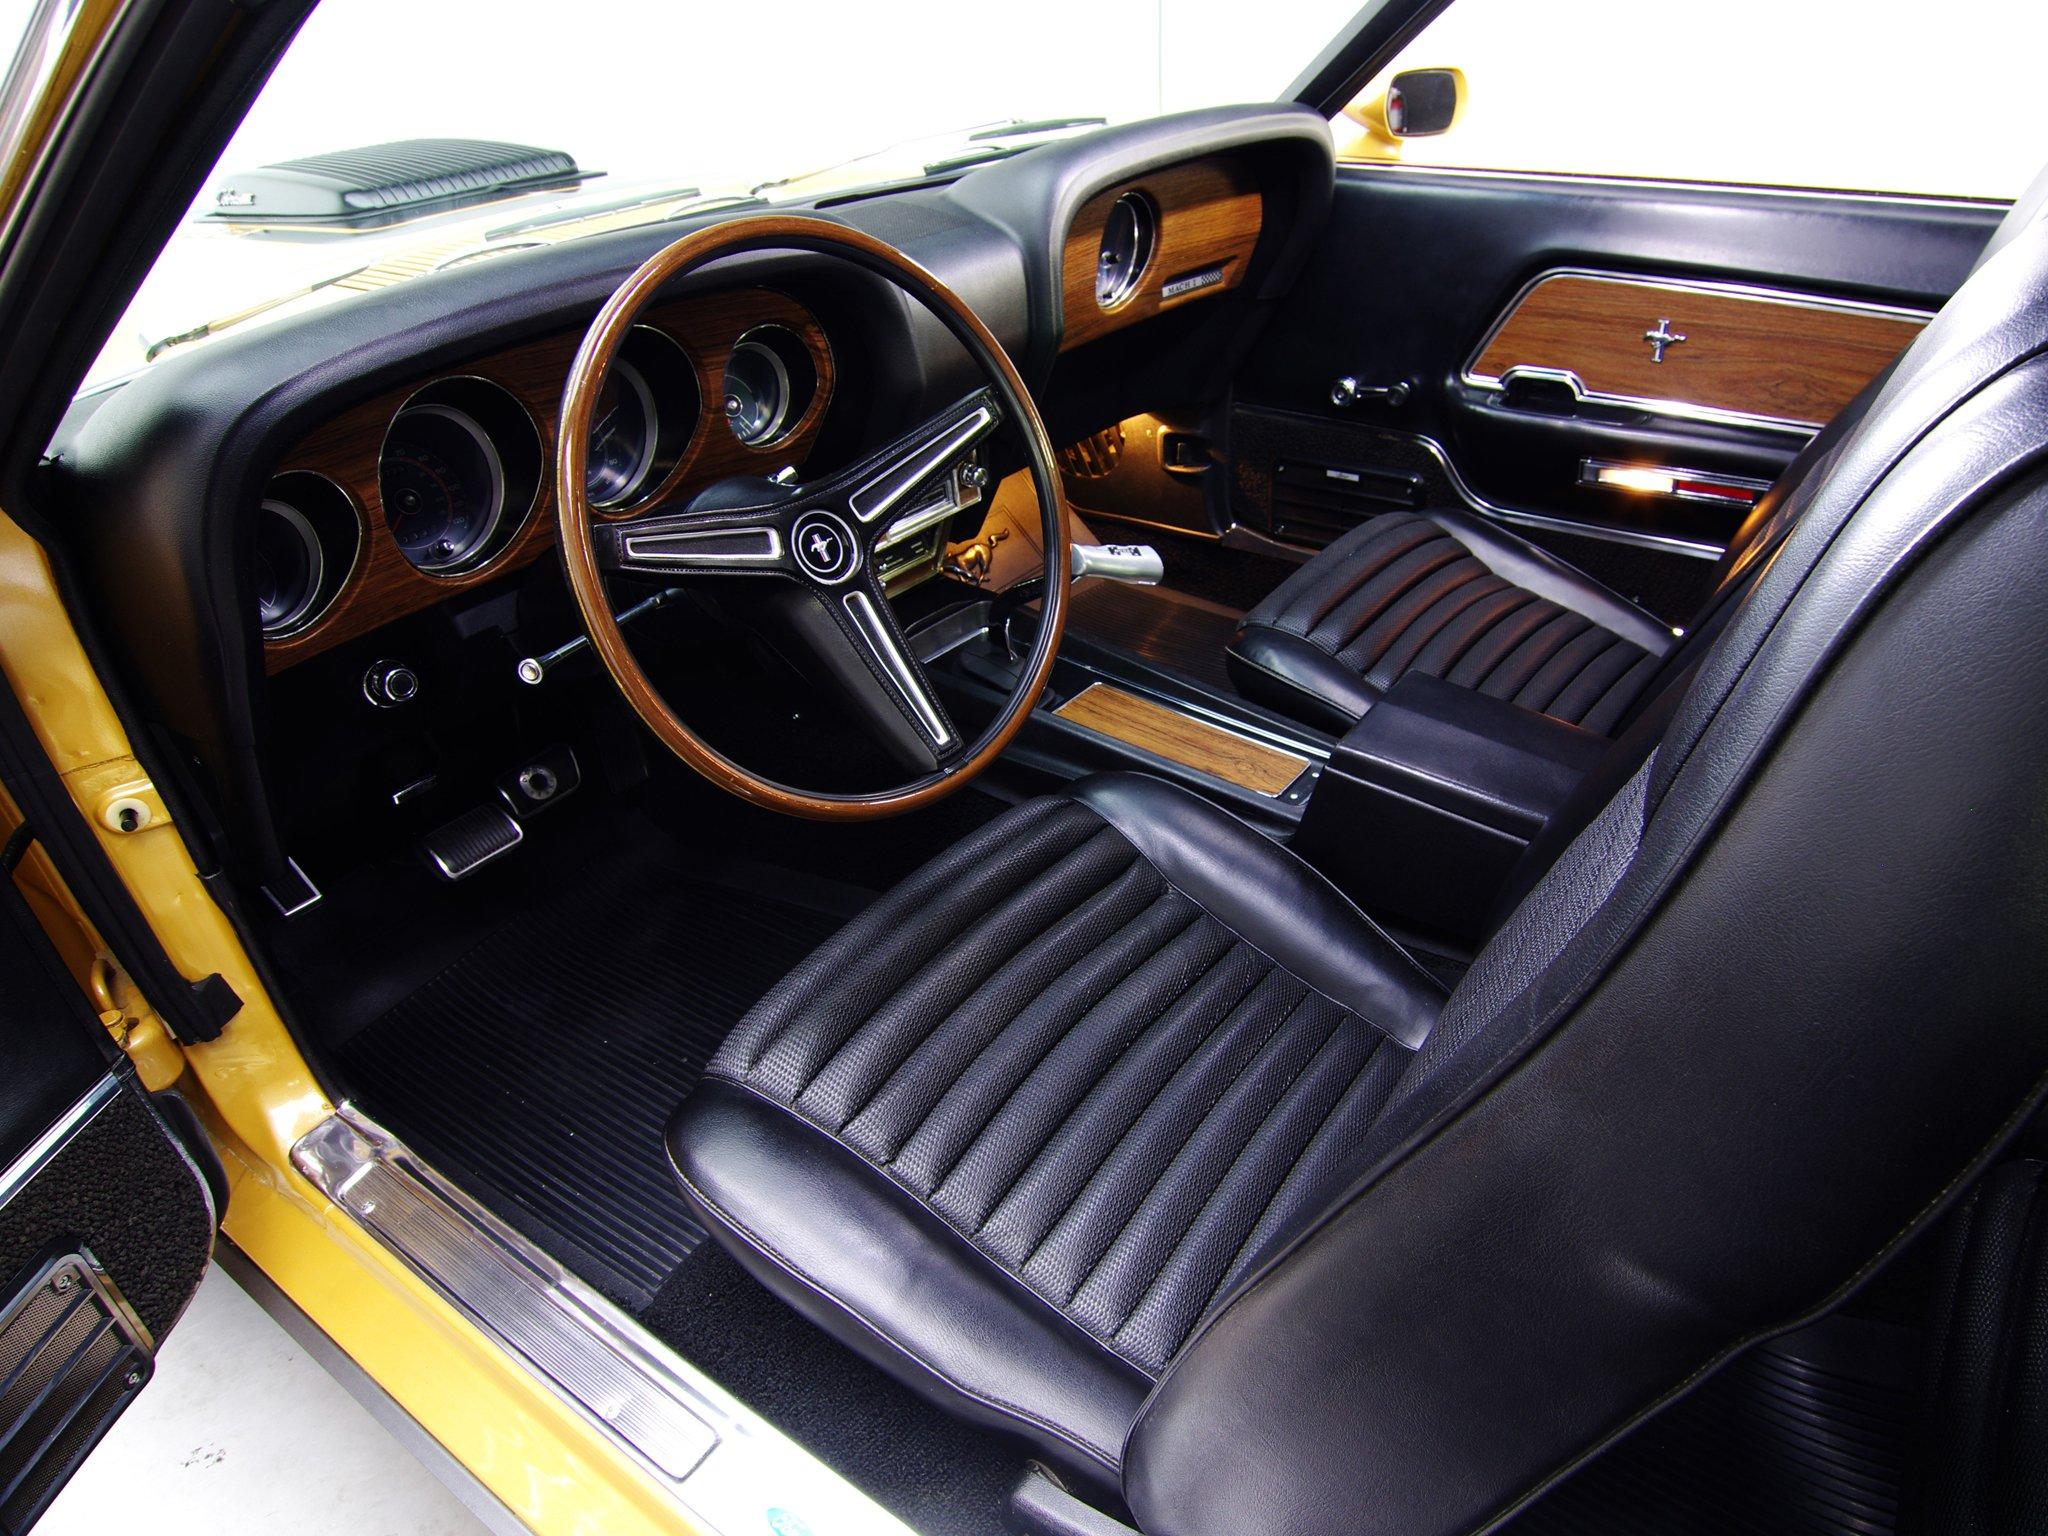 1970 ford mustang mach 1 428 super cobra jet muscle classic interior e wallpaper 2048x1536. Black Bedroom Furniture Sets. Home Design Ideas